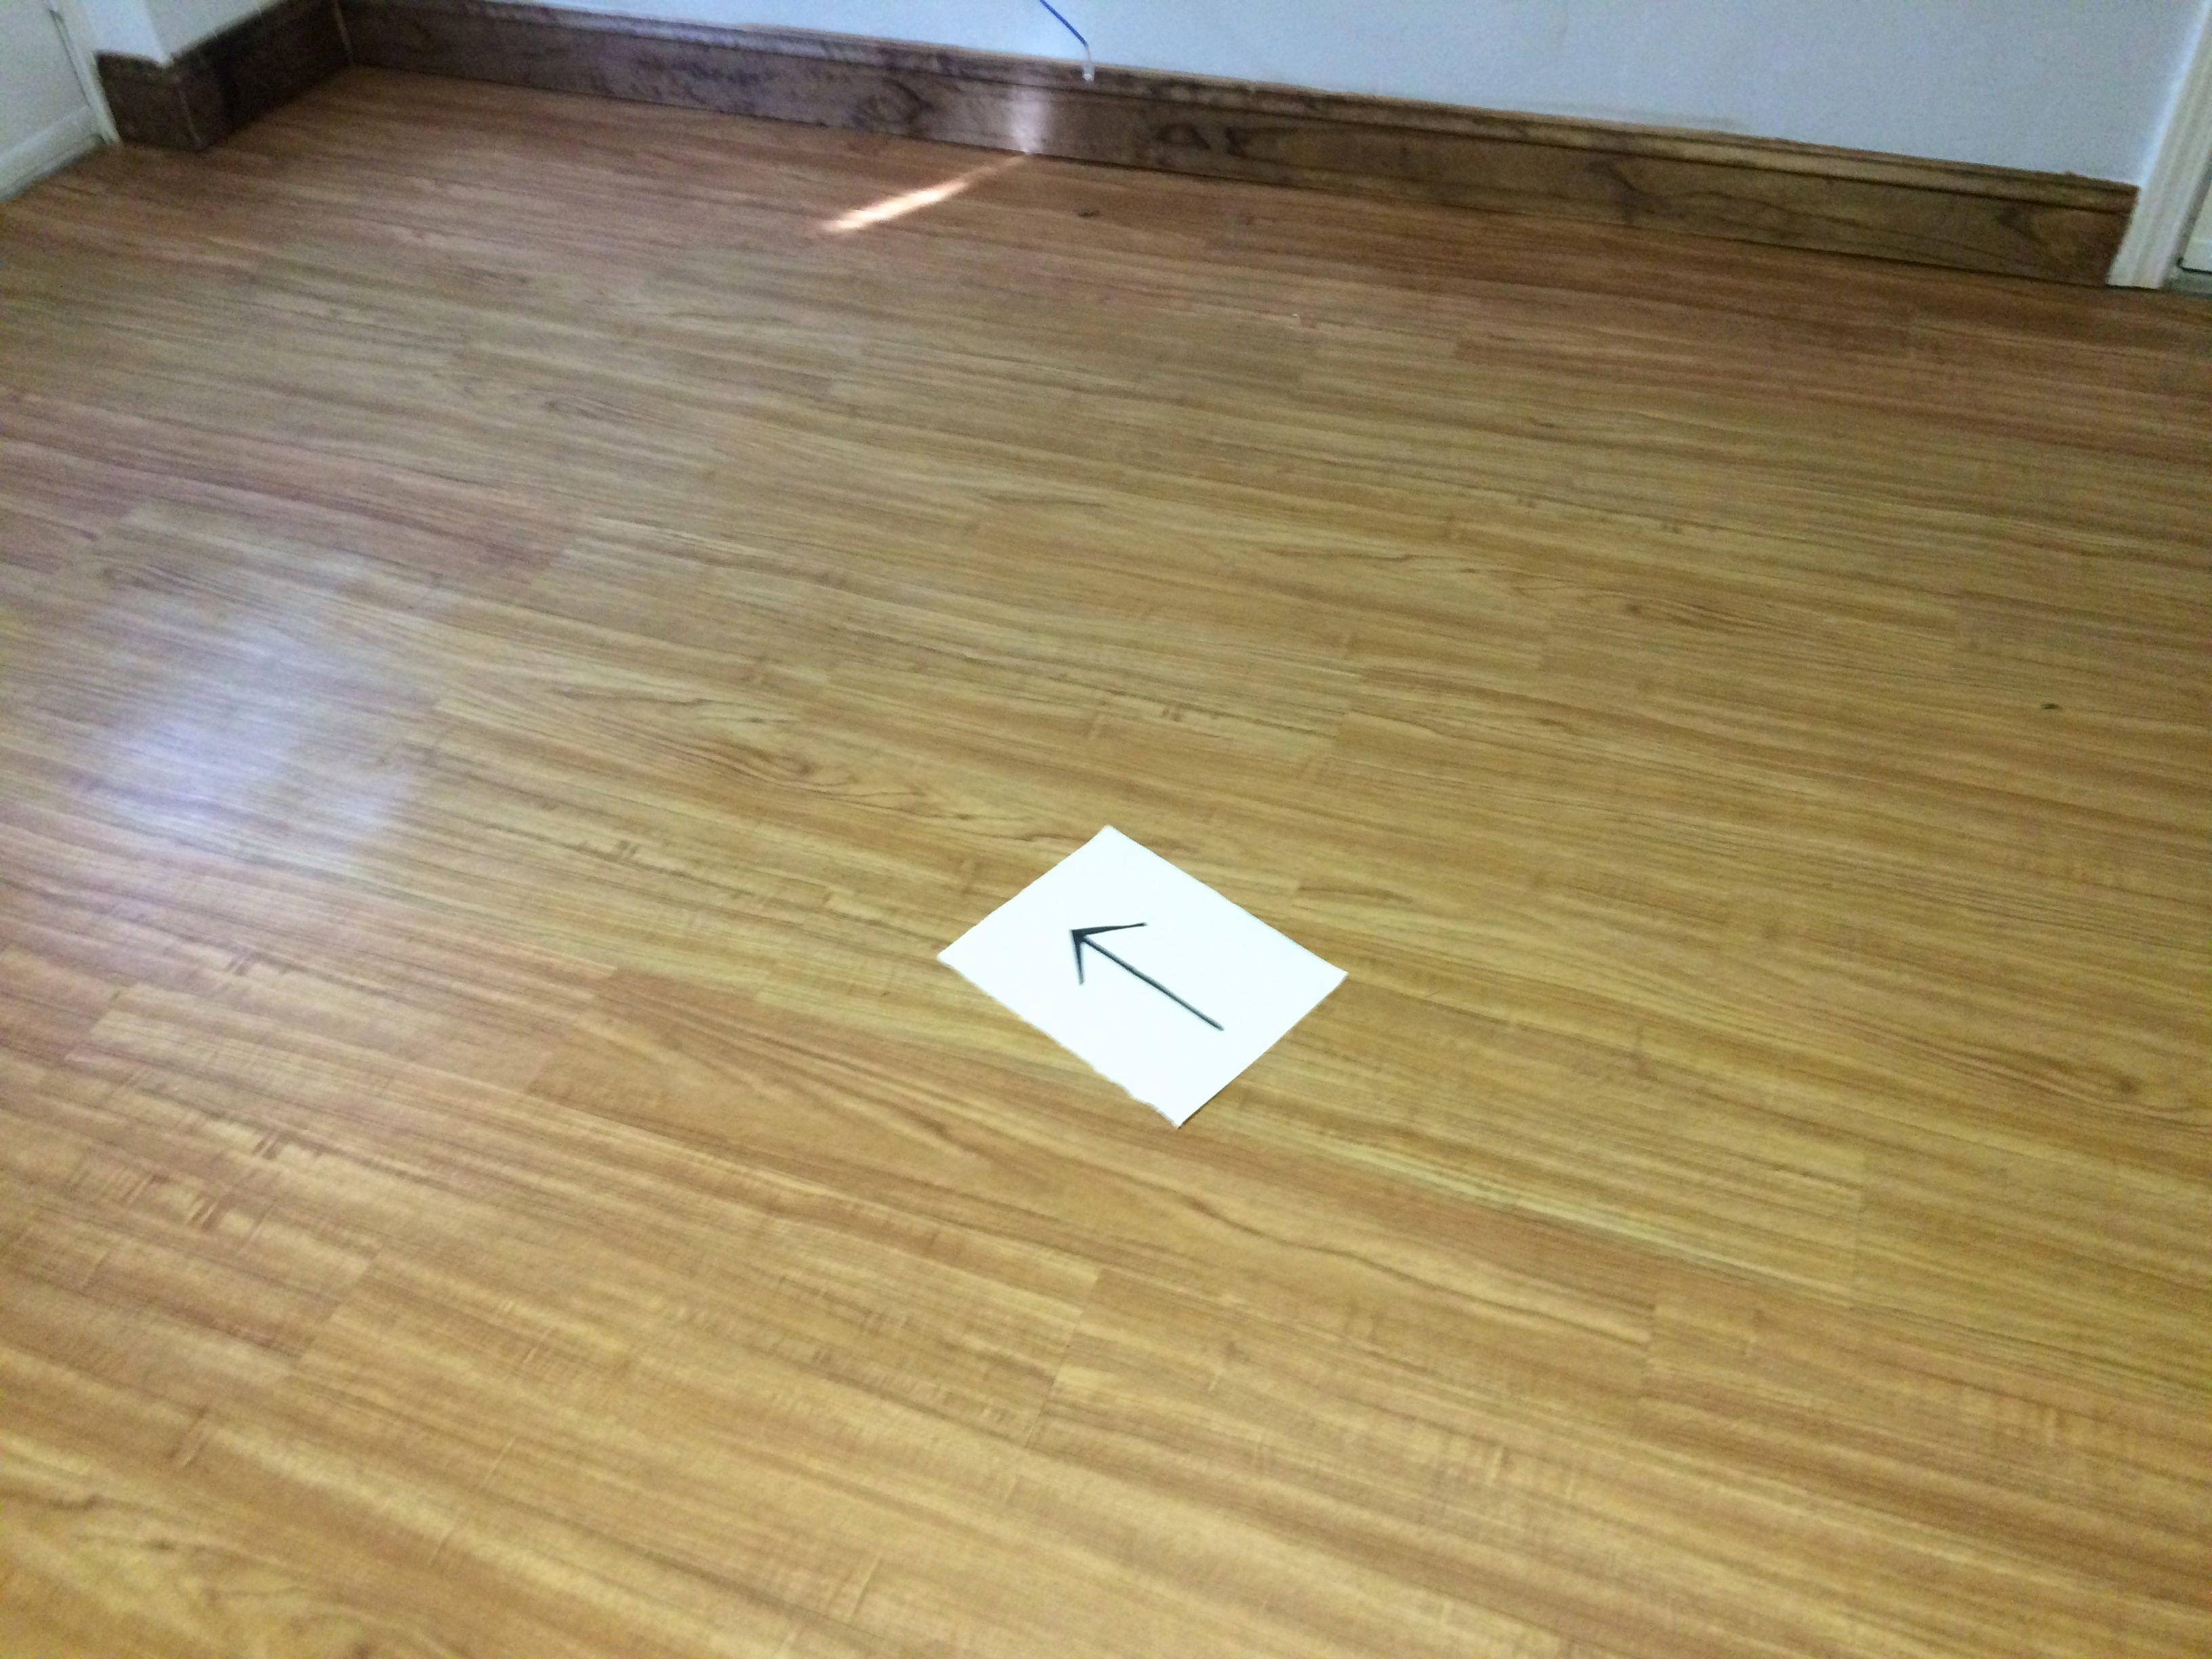 hardwood floor stain home depot of paint for wood floors home depot luxury the home depot accroalamode in paint for wood floors home depot fresh 50 beautiful hardwood floor estimate 50 s of paint